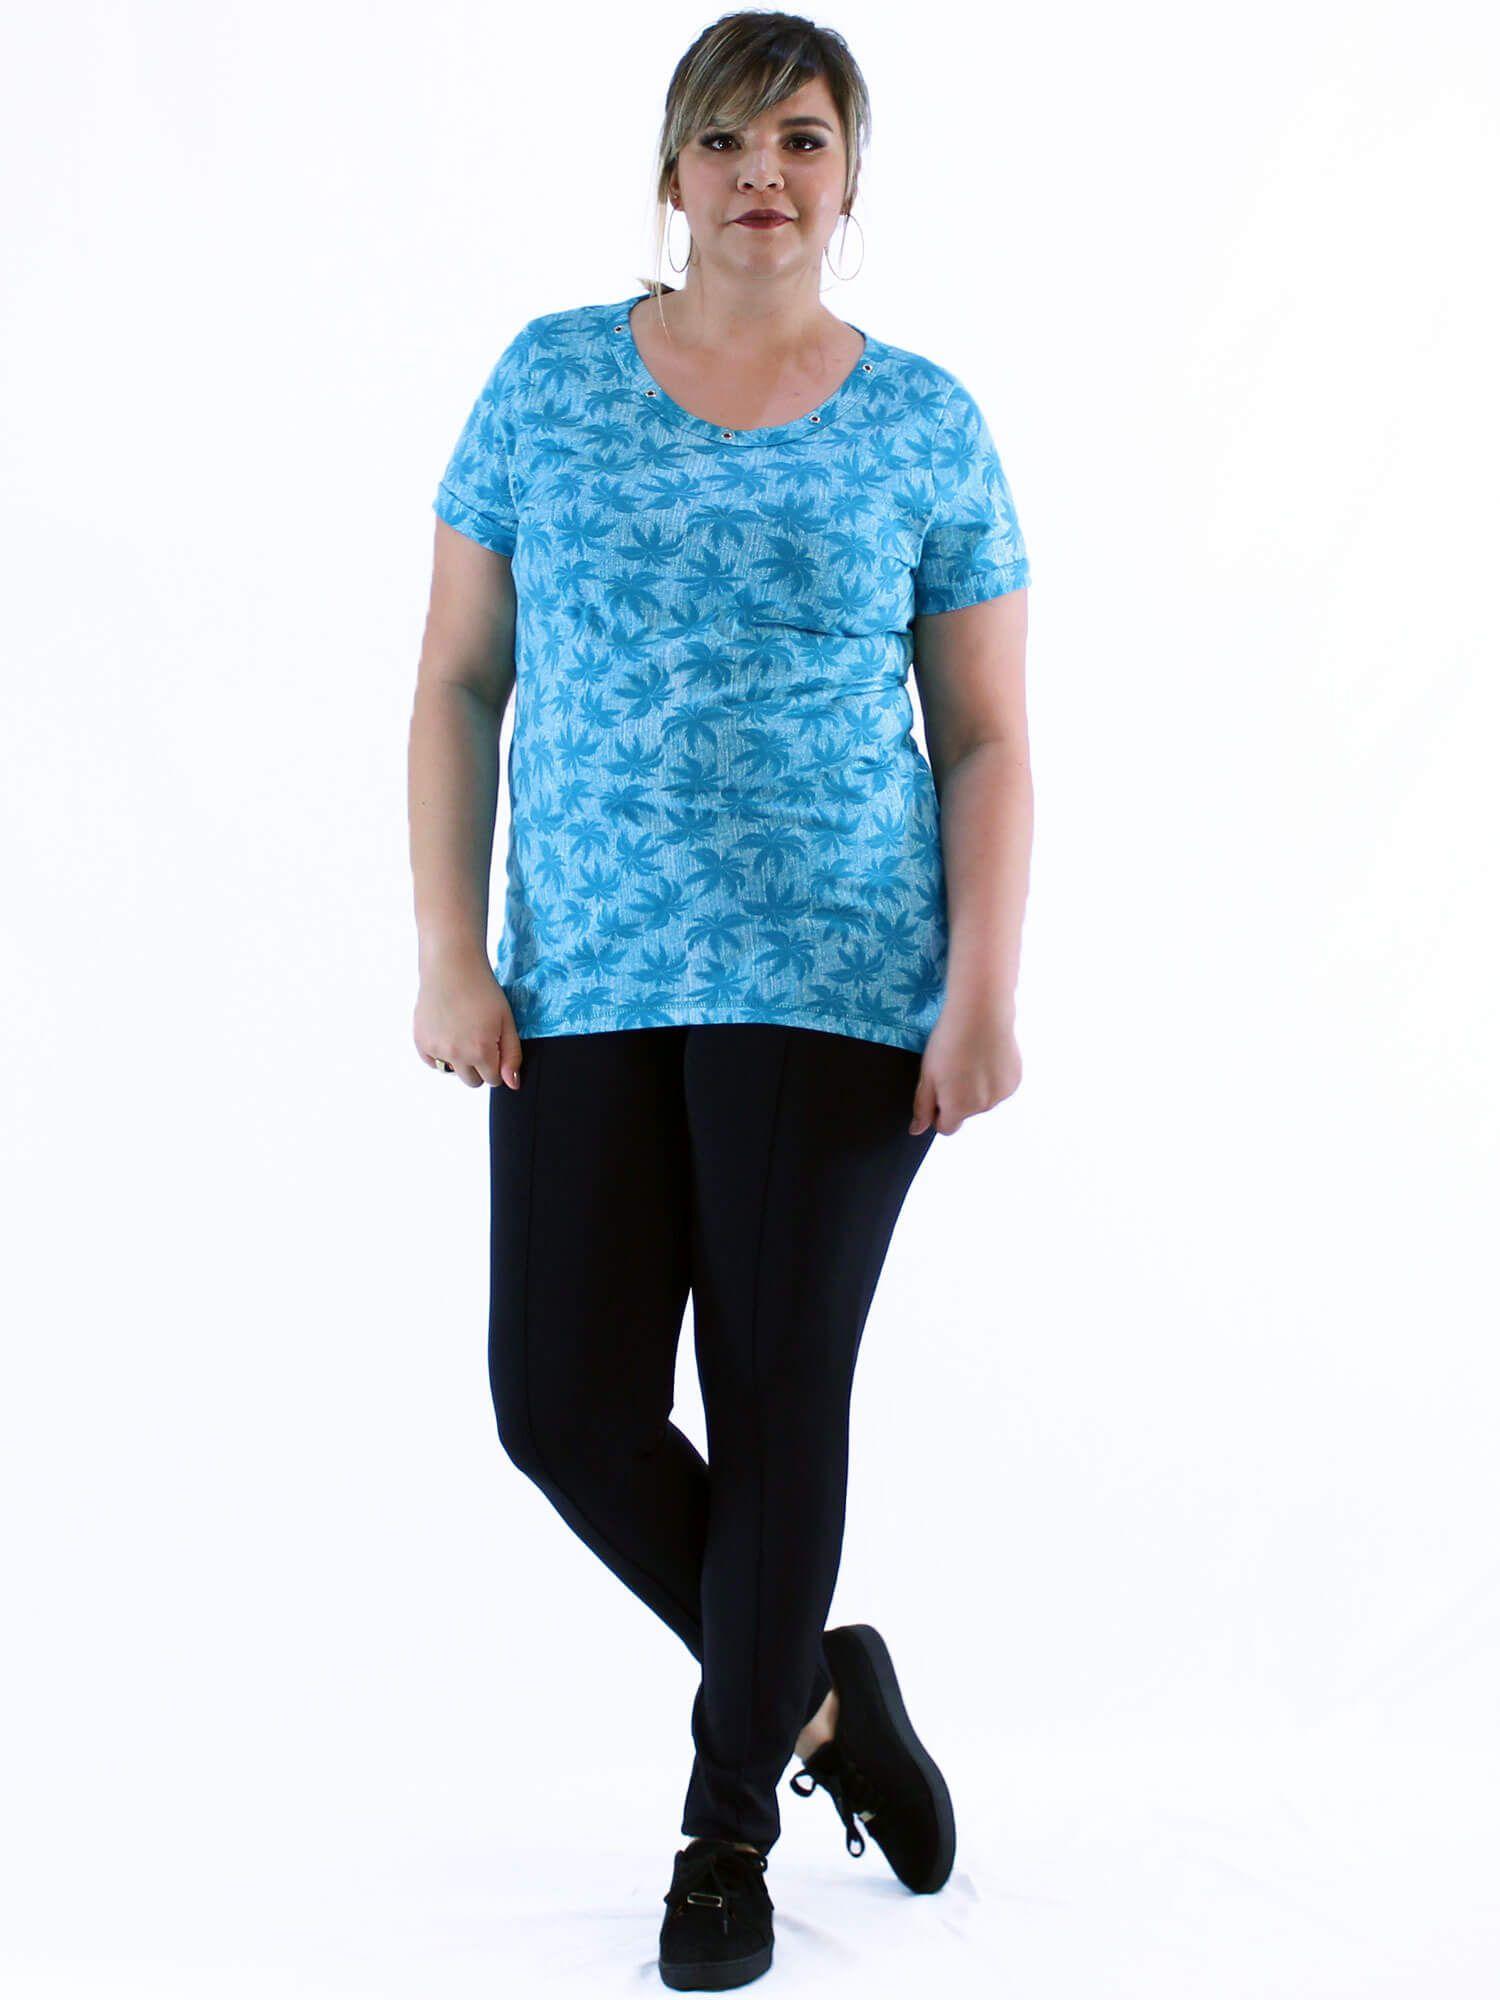 Blusa Plus Size KTS Decote Aberto com Ilhós Azul